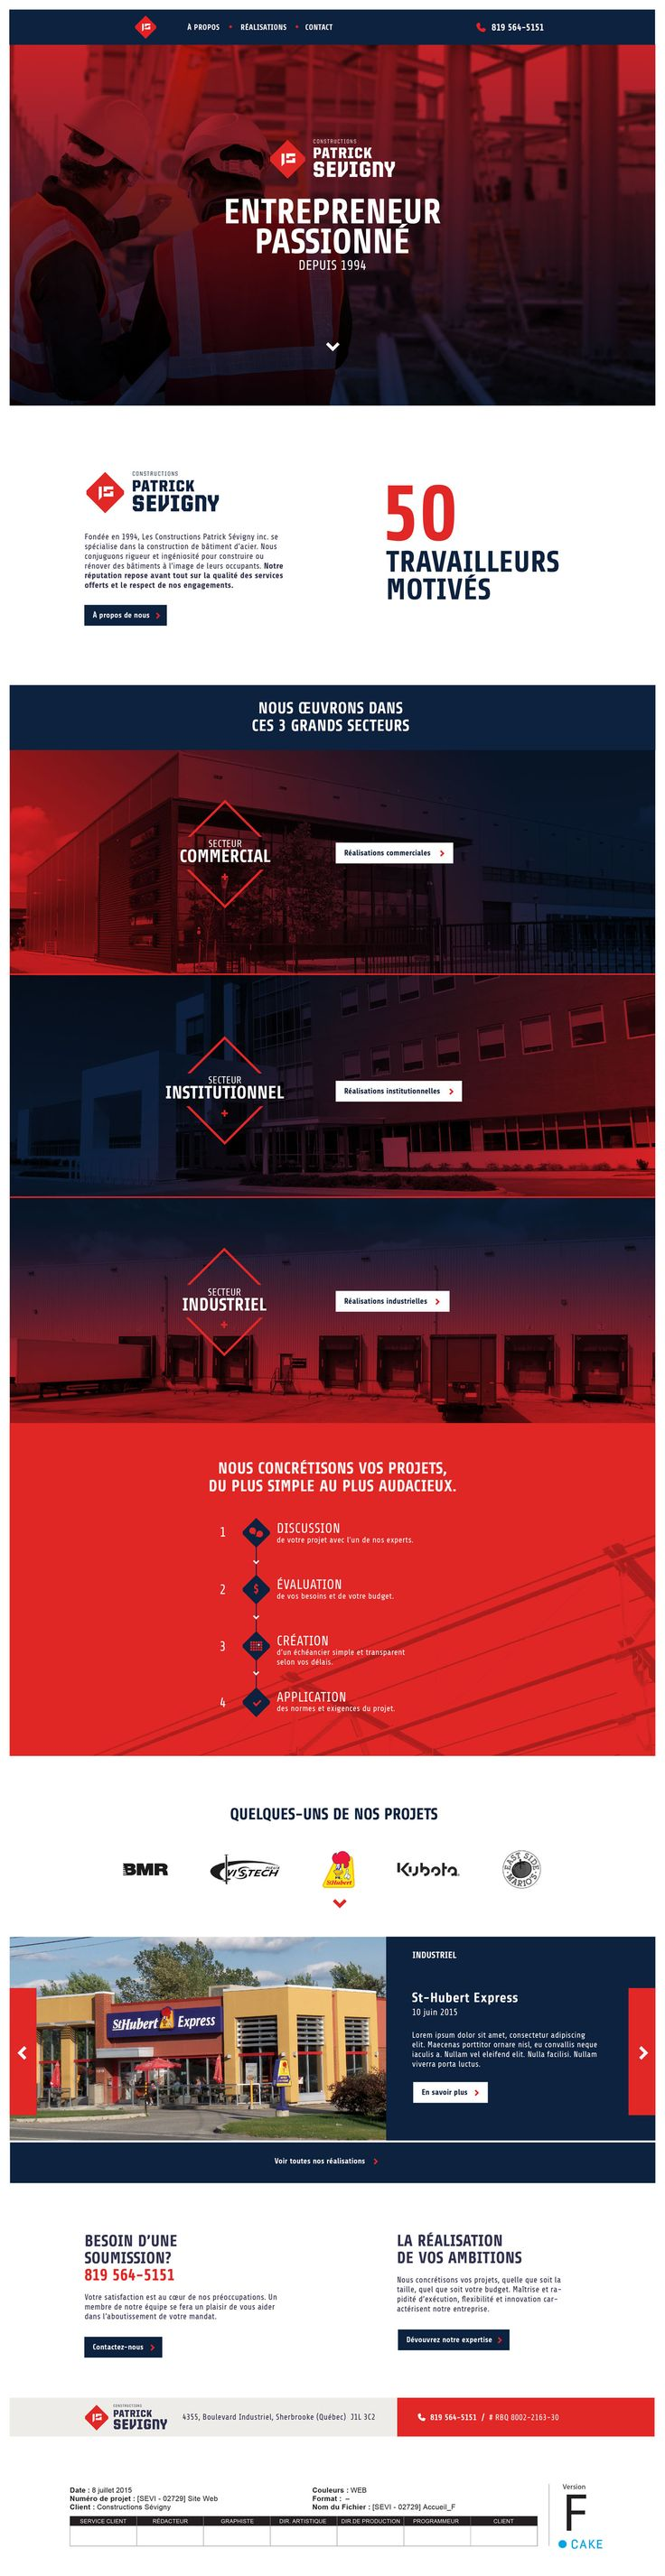 http://constructionspatricksevigny.com Conception du site Web. Design | Website | Layout